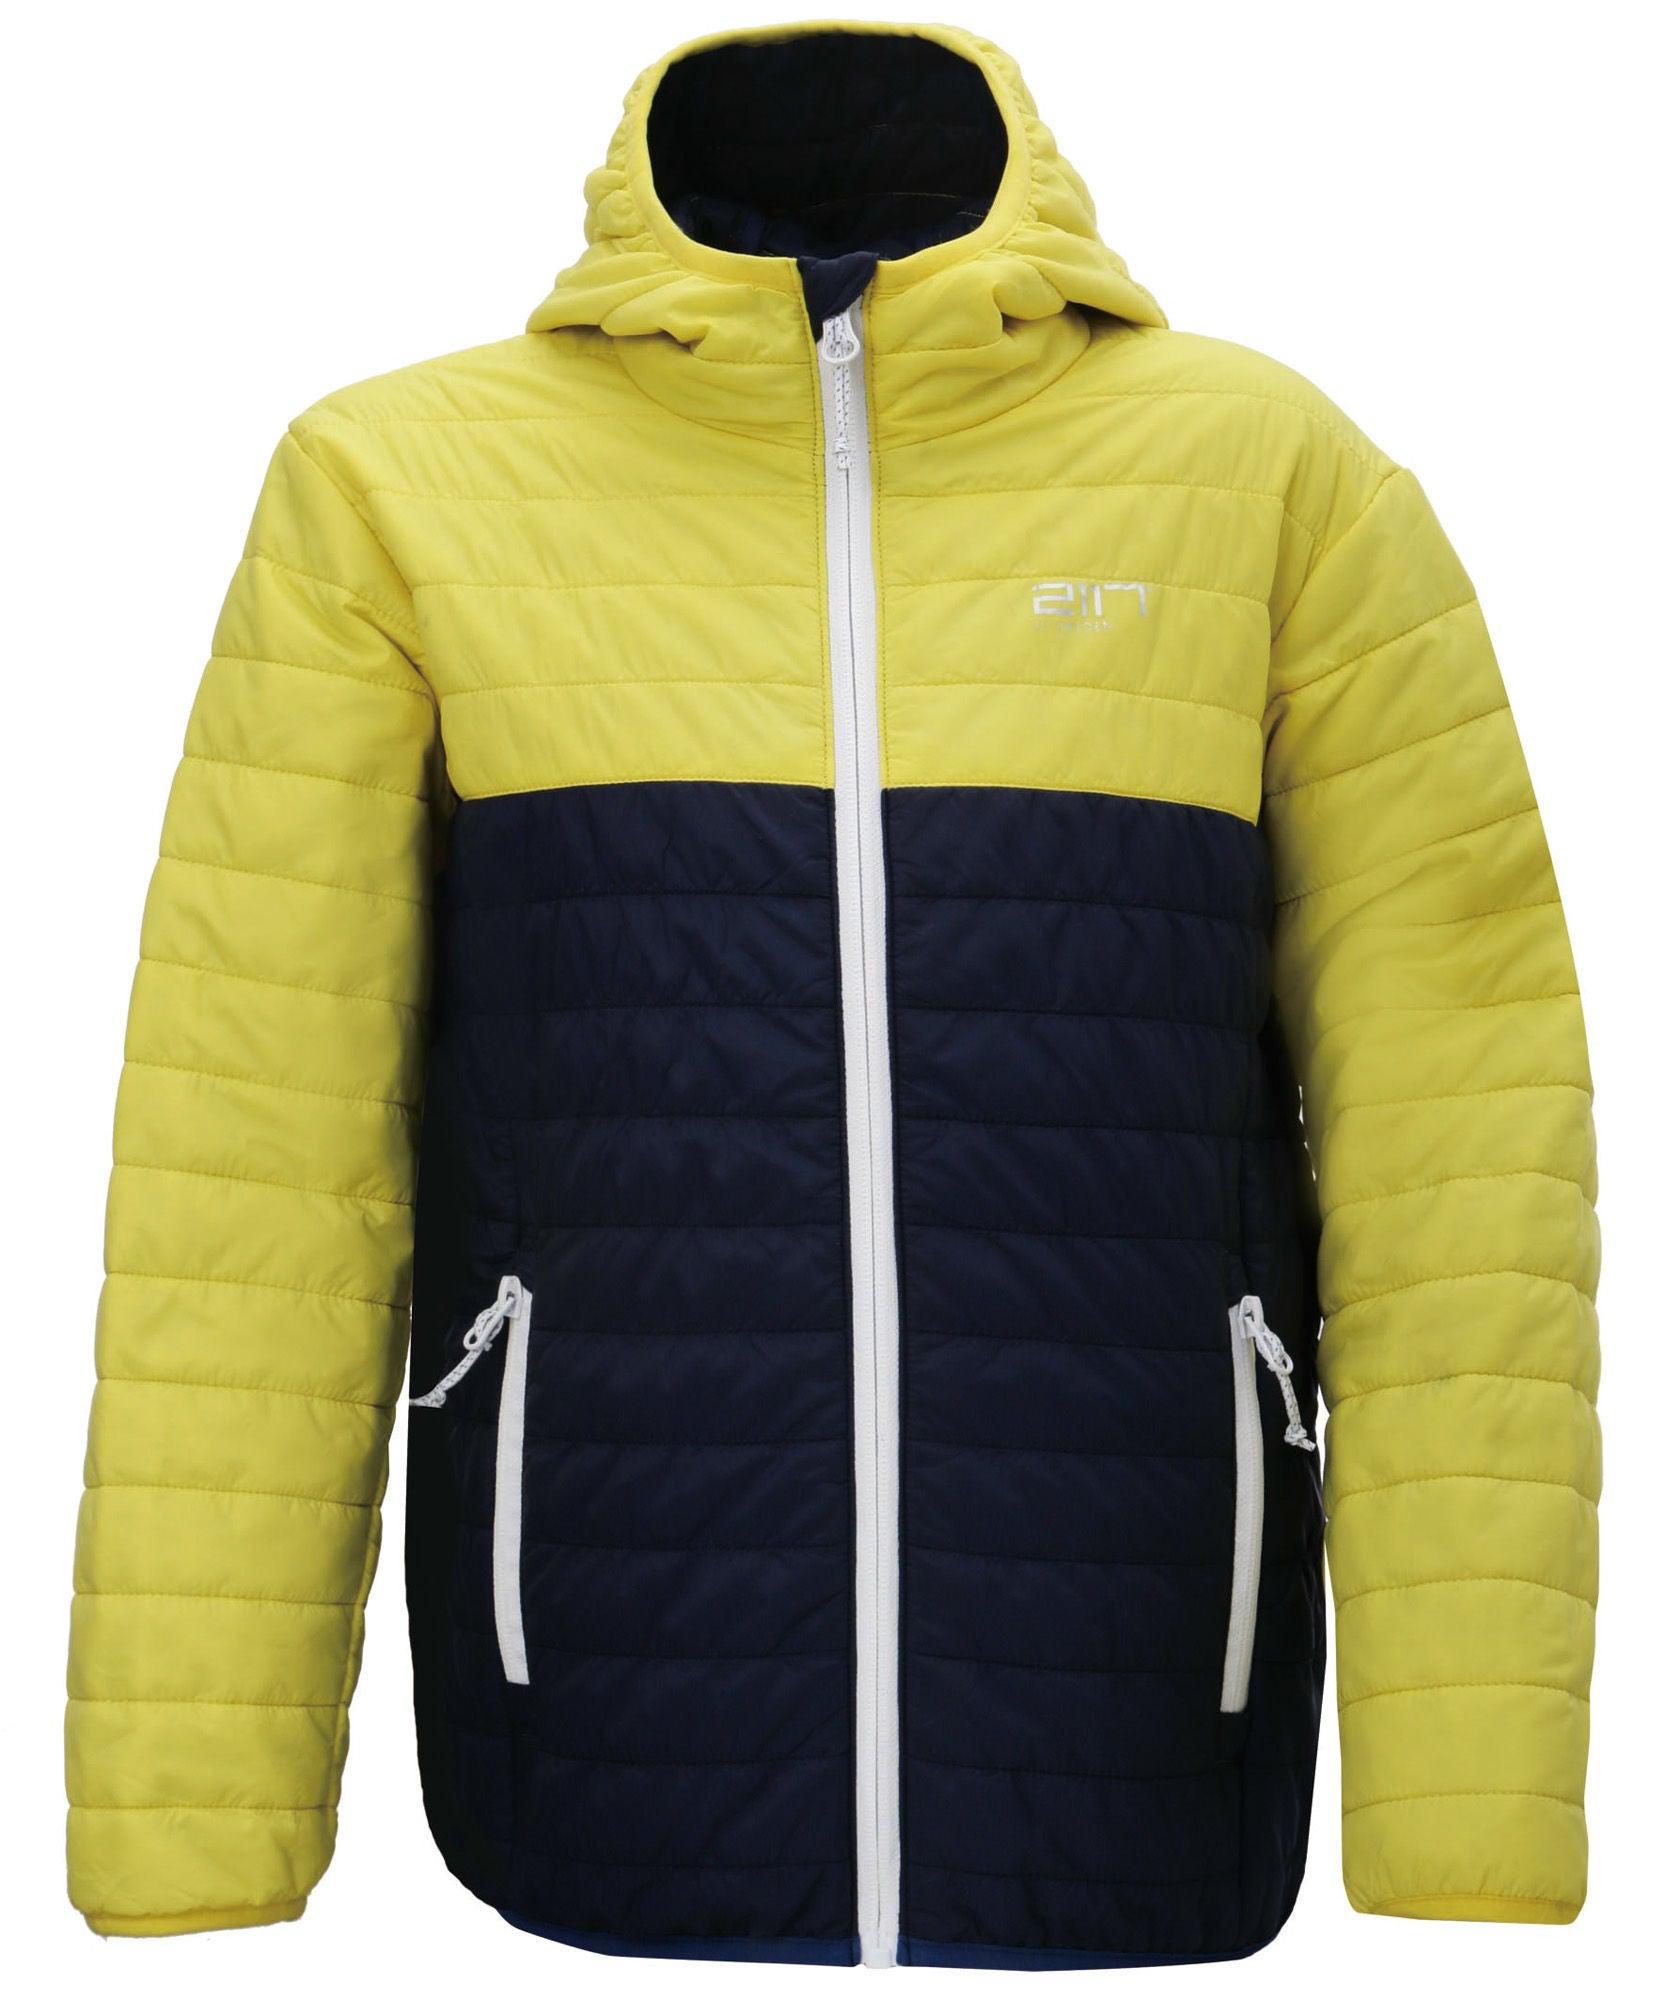 Køb 2117 Vallerås Jakke Dreng, Yellow | Jollyroom